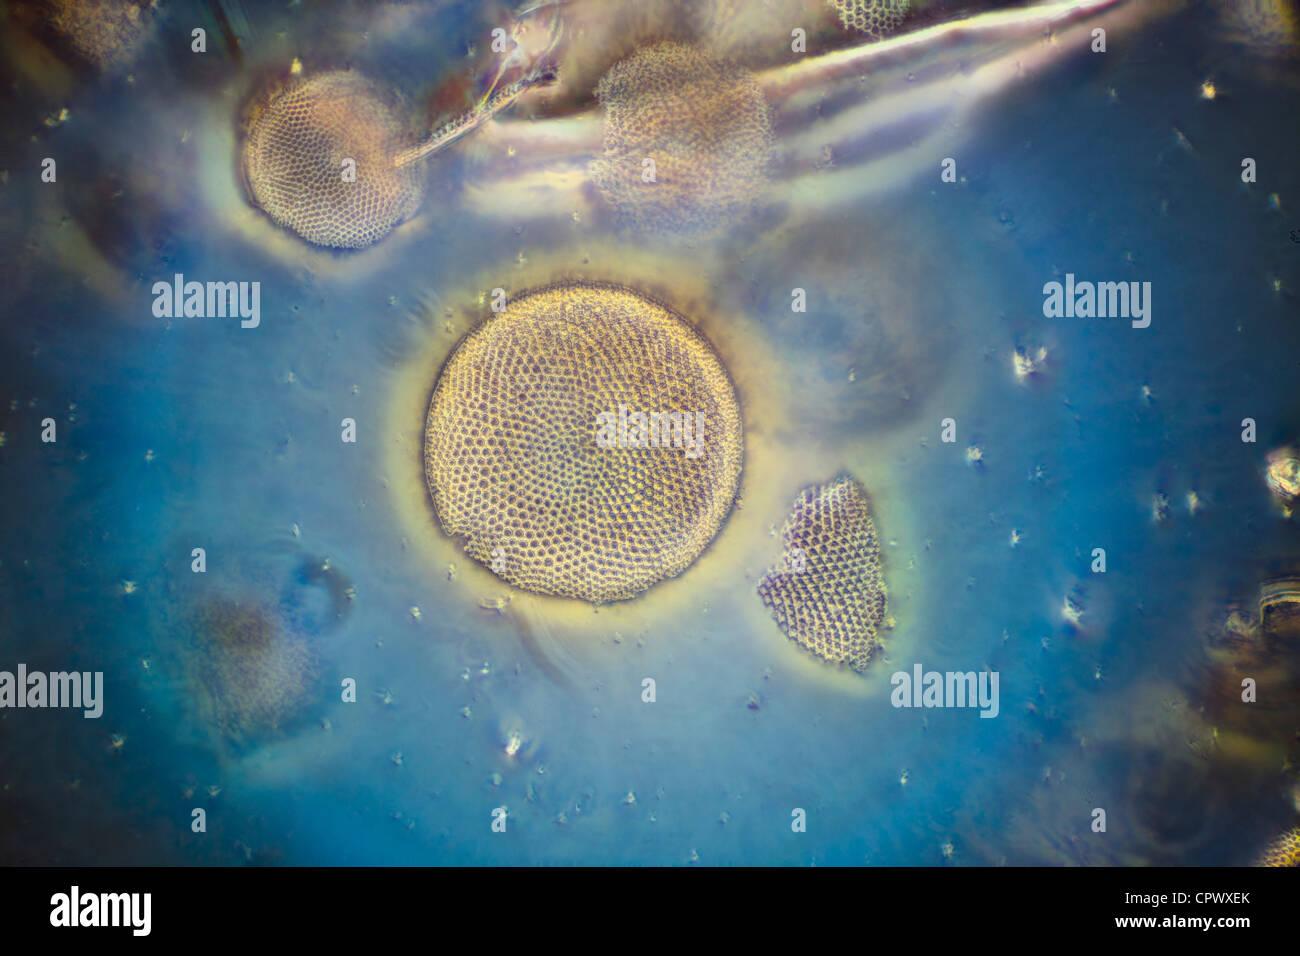 Darkfield photomicrograph, Pliocene fossil marine diatoms, Oran Algeria - Stock Image